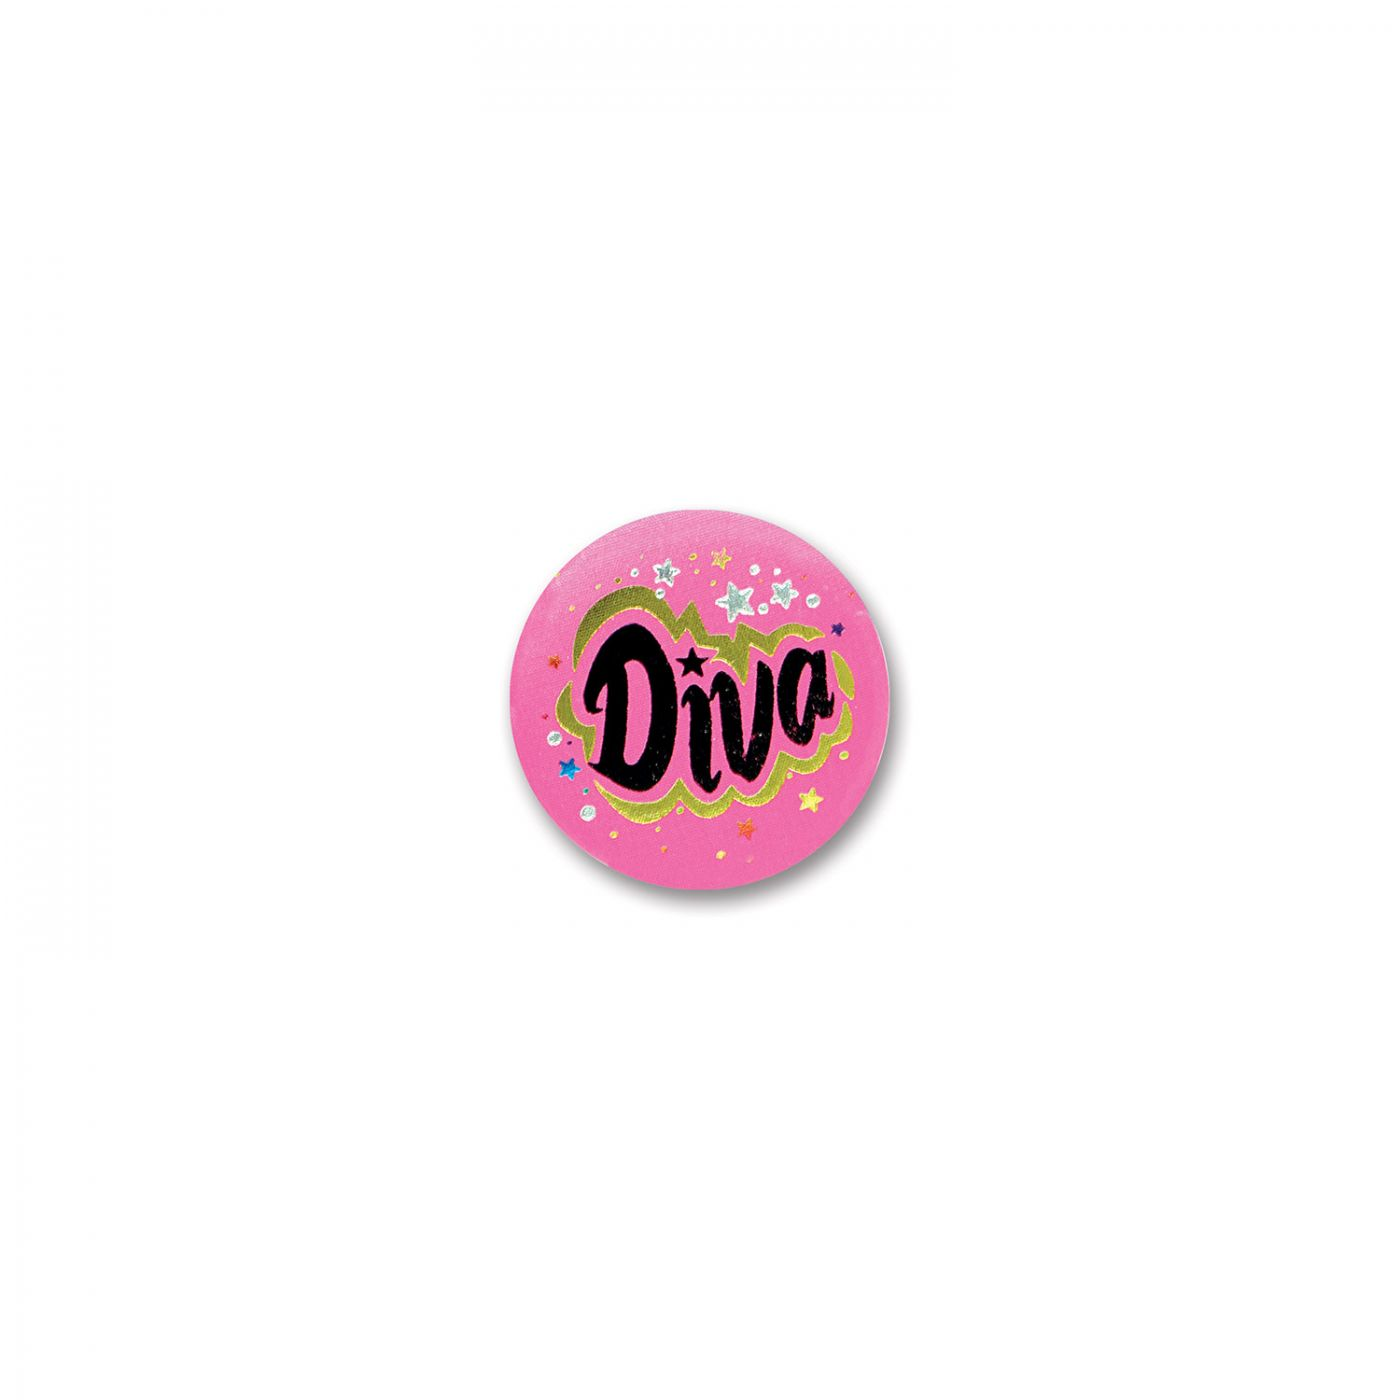 Diva Satin Button (6) image